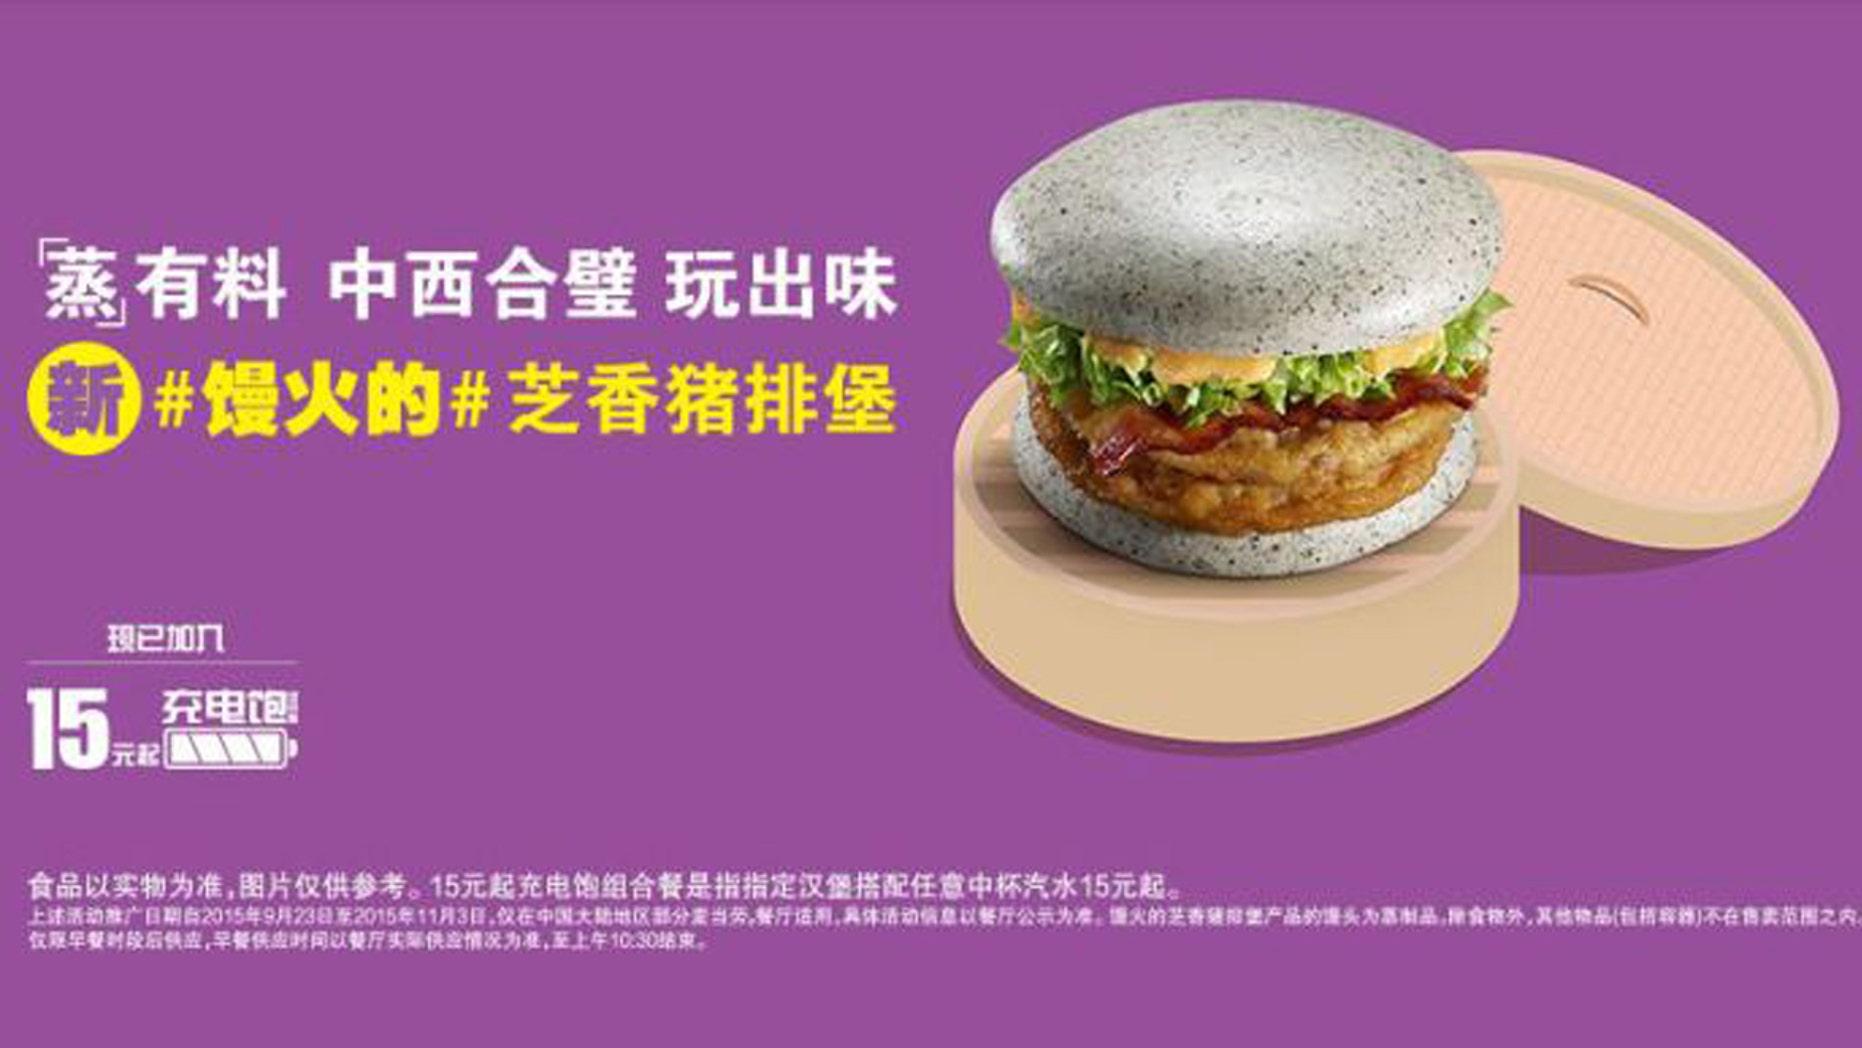 The new Modern Chinese Burger has grey buns with darker flecks.